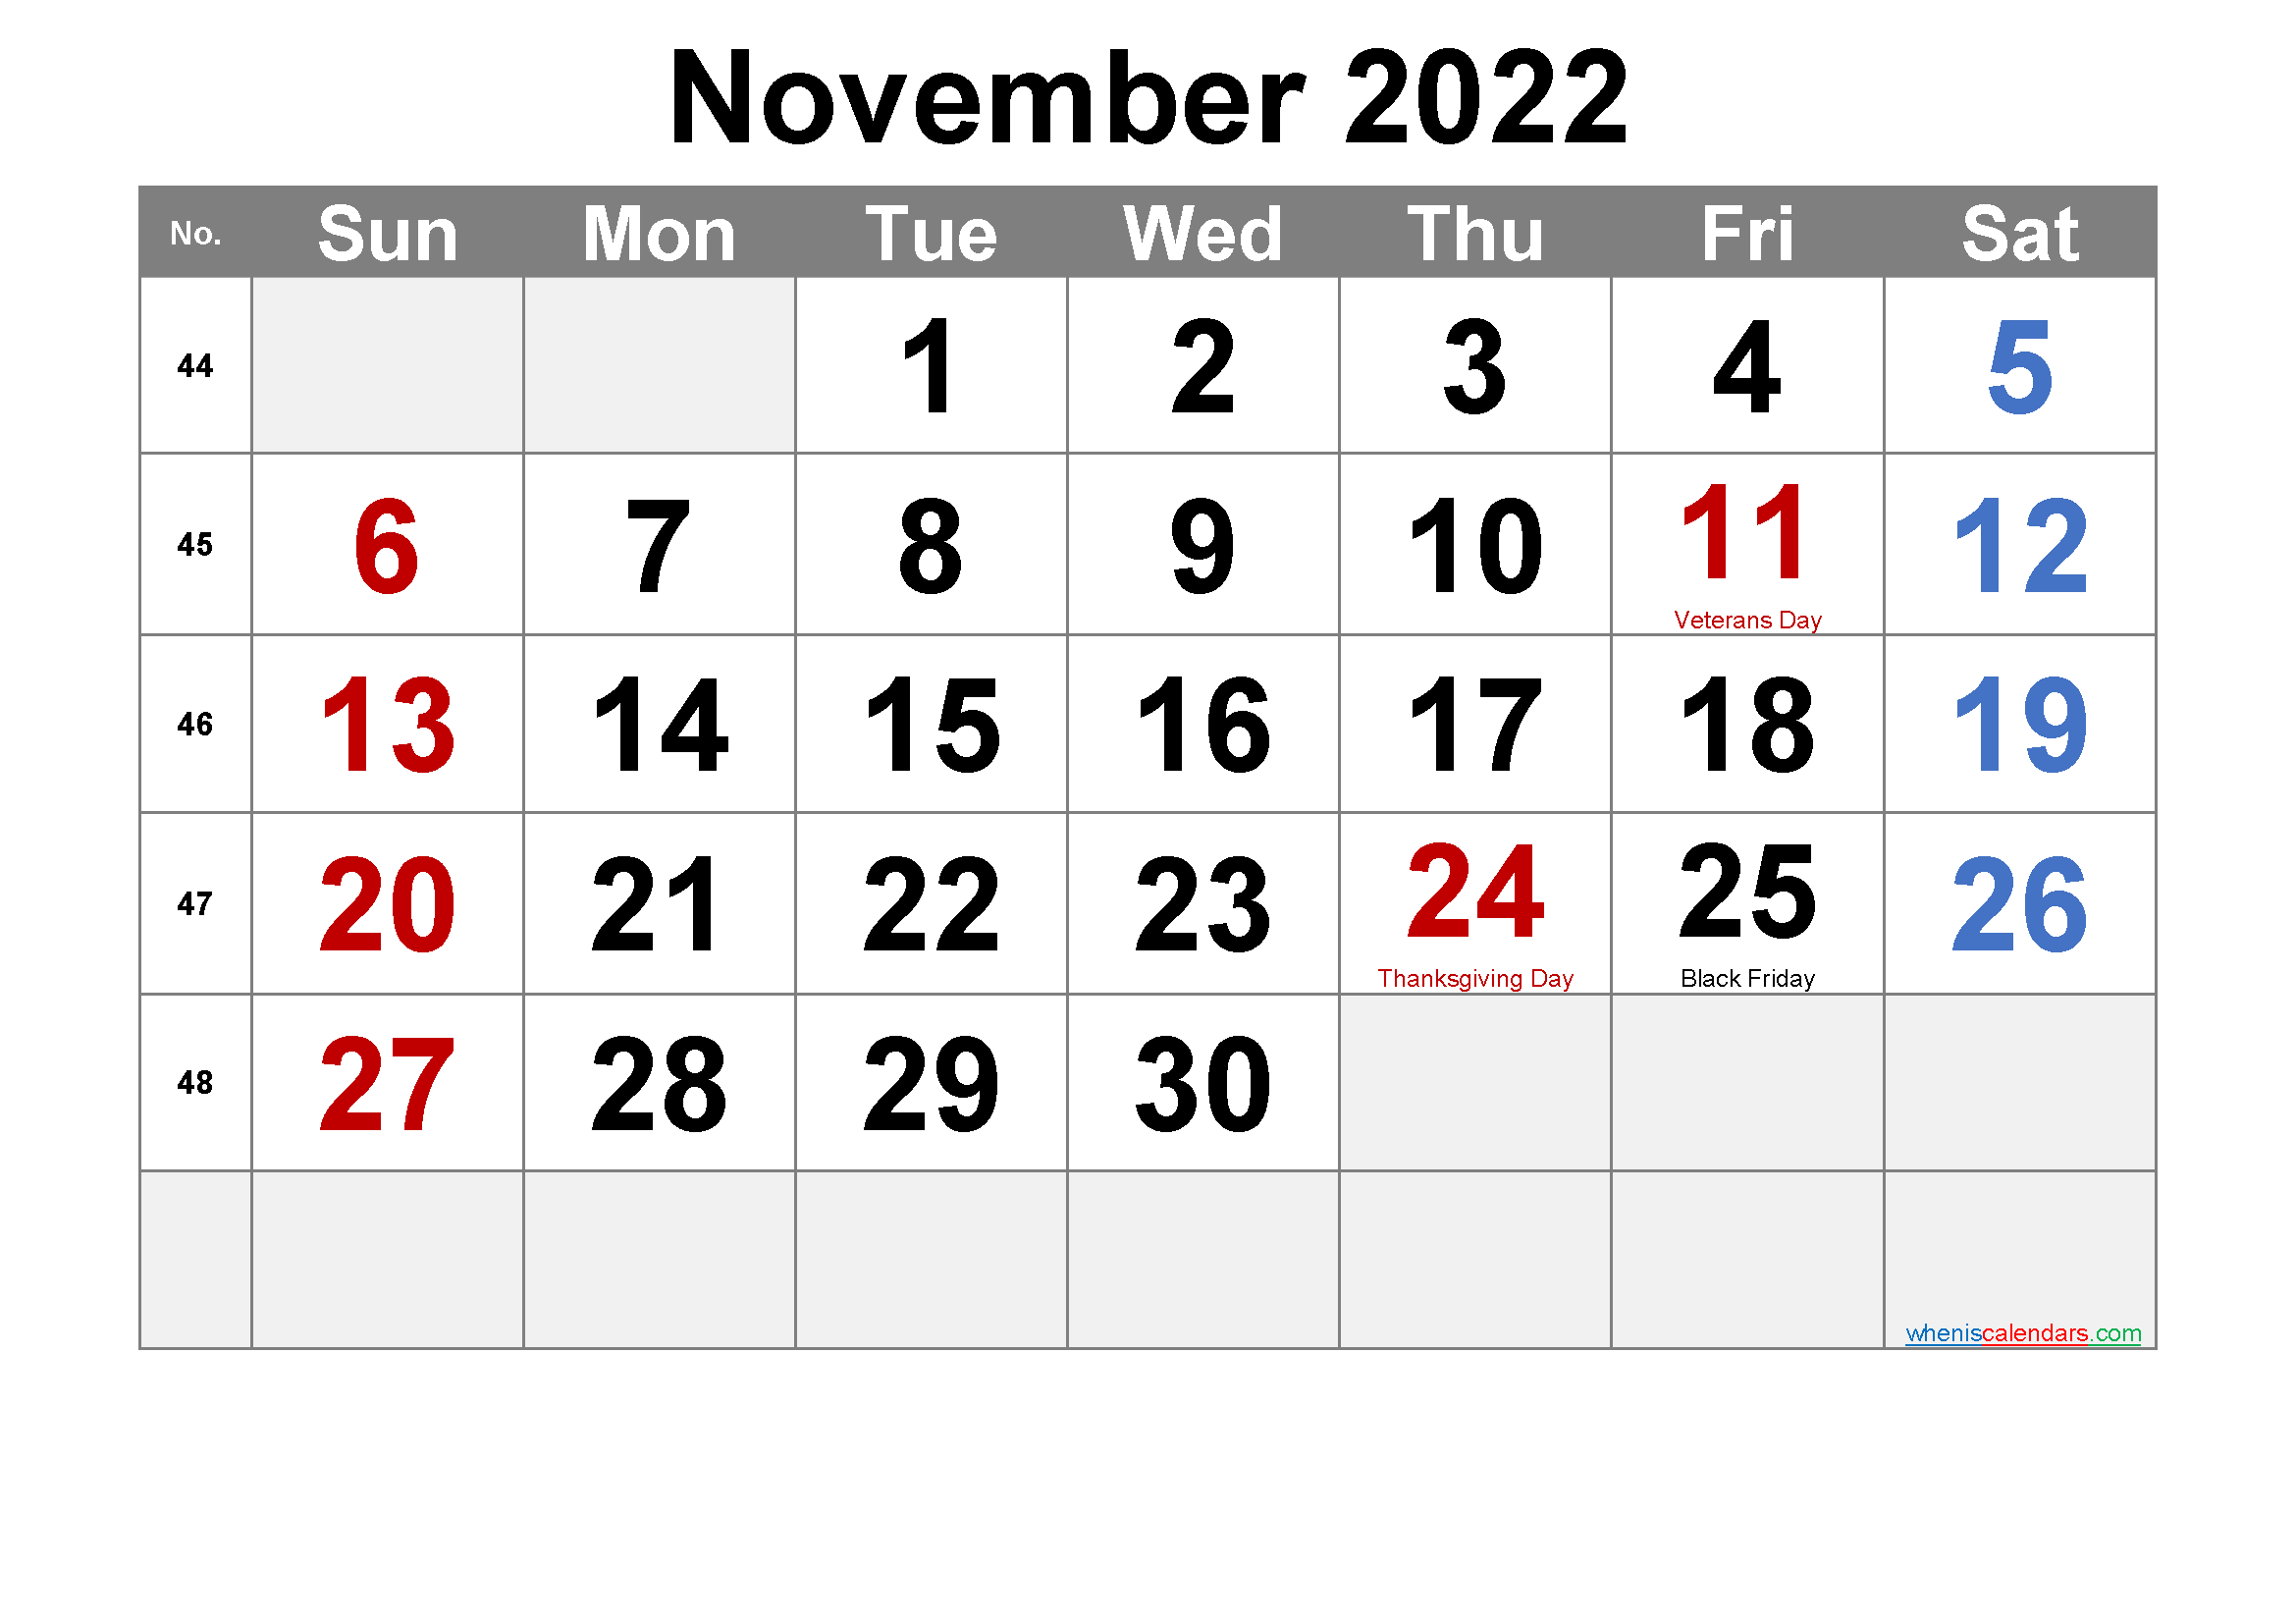 NOVEMBER 2022 Printable Calendar with Holidays